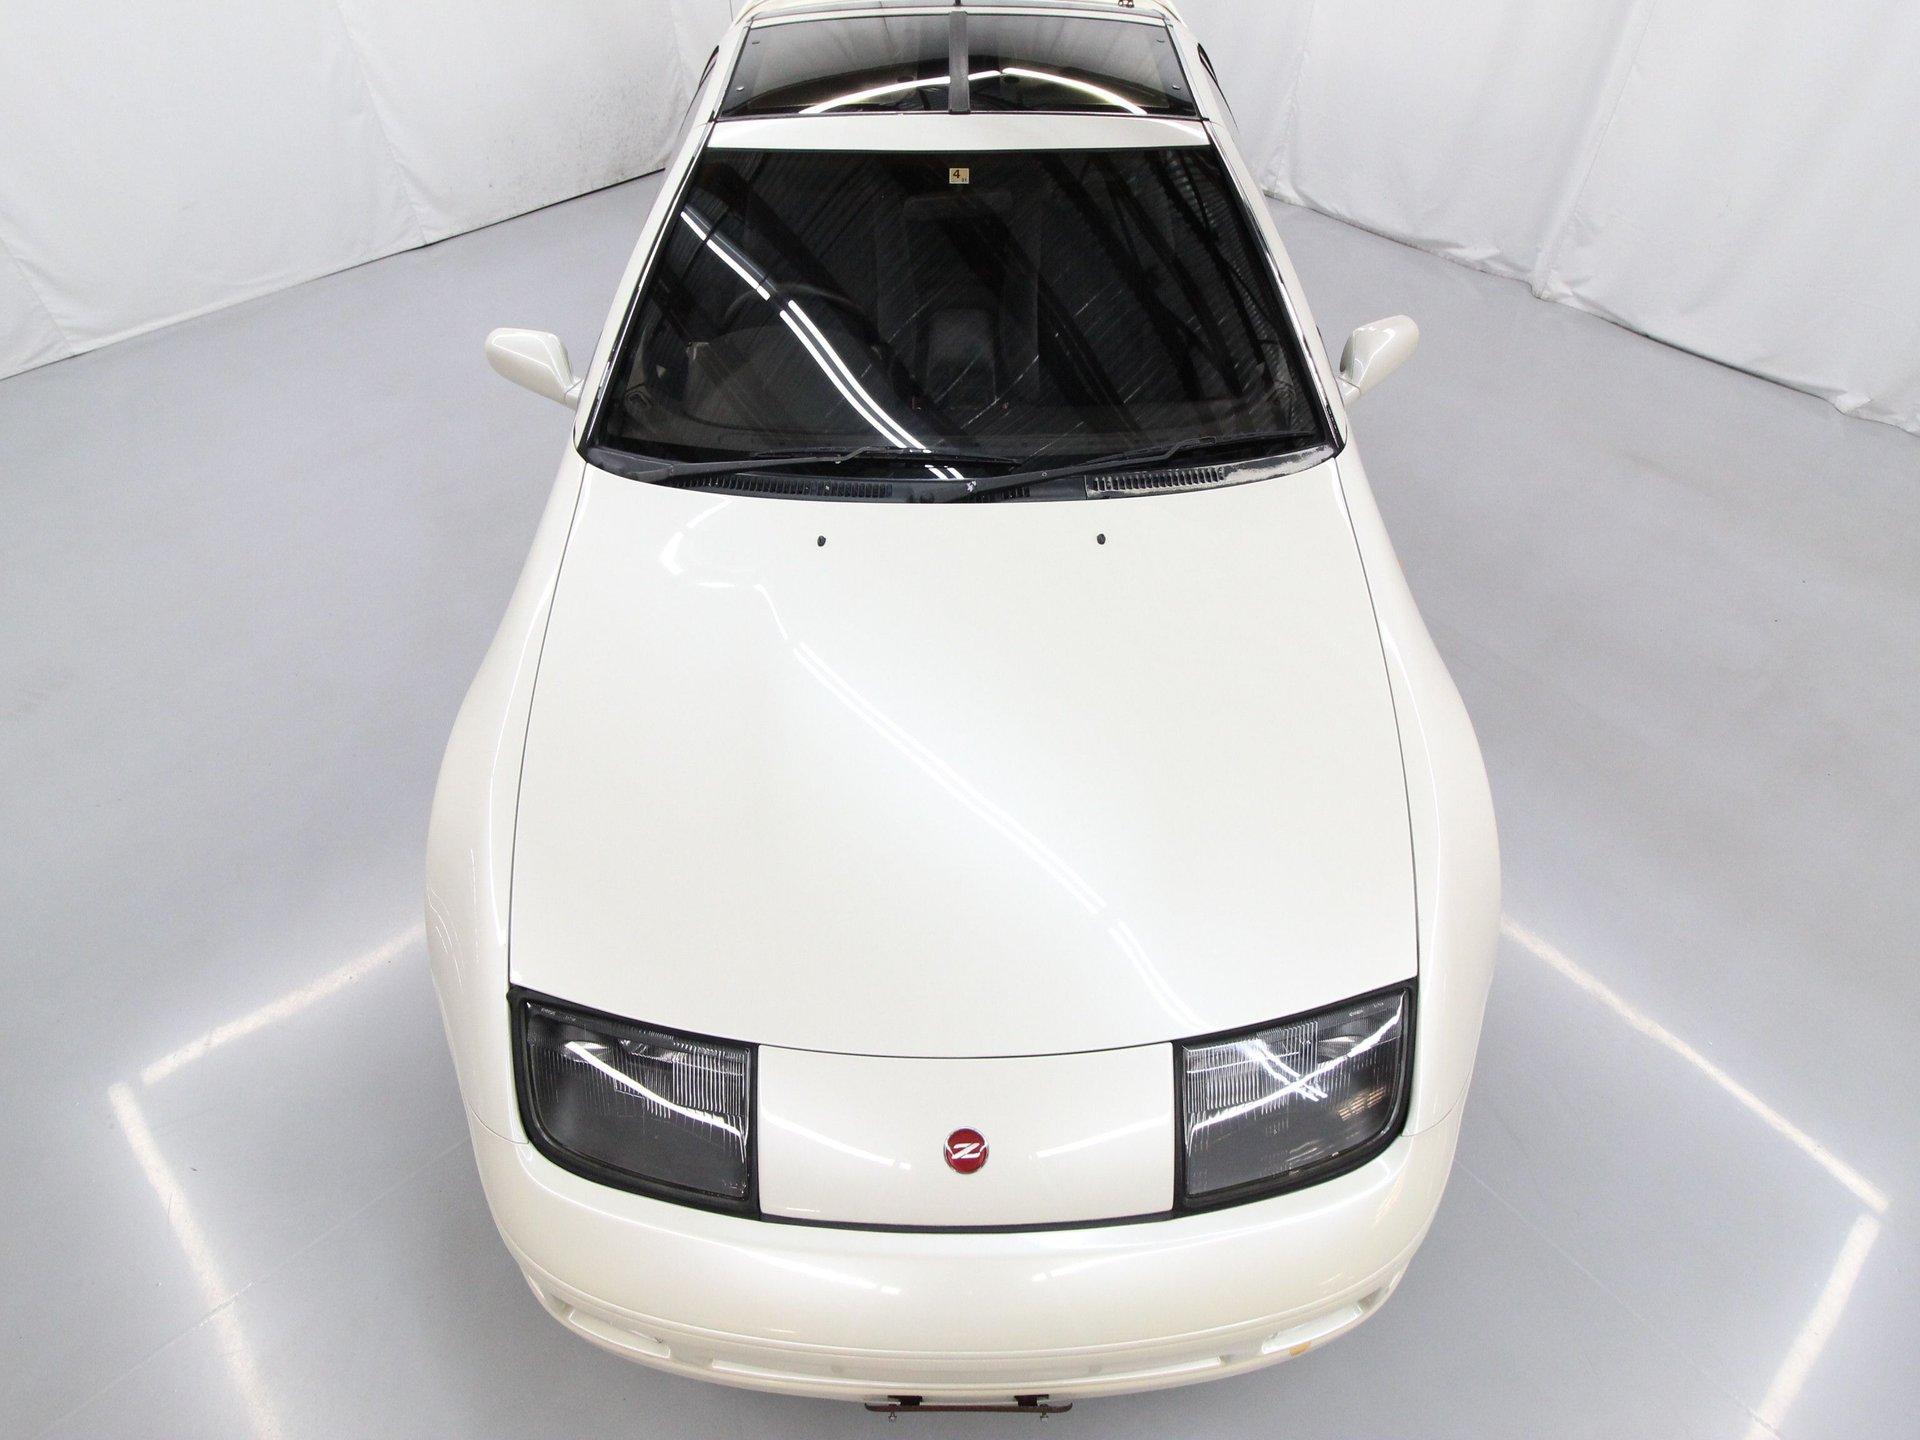 1993 Nissan Fairlady 300ZX